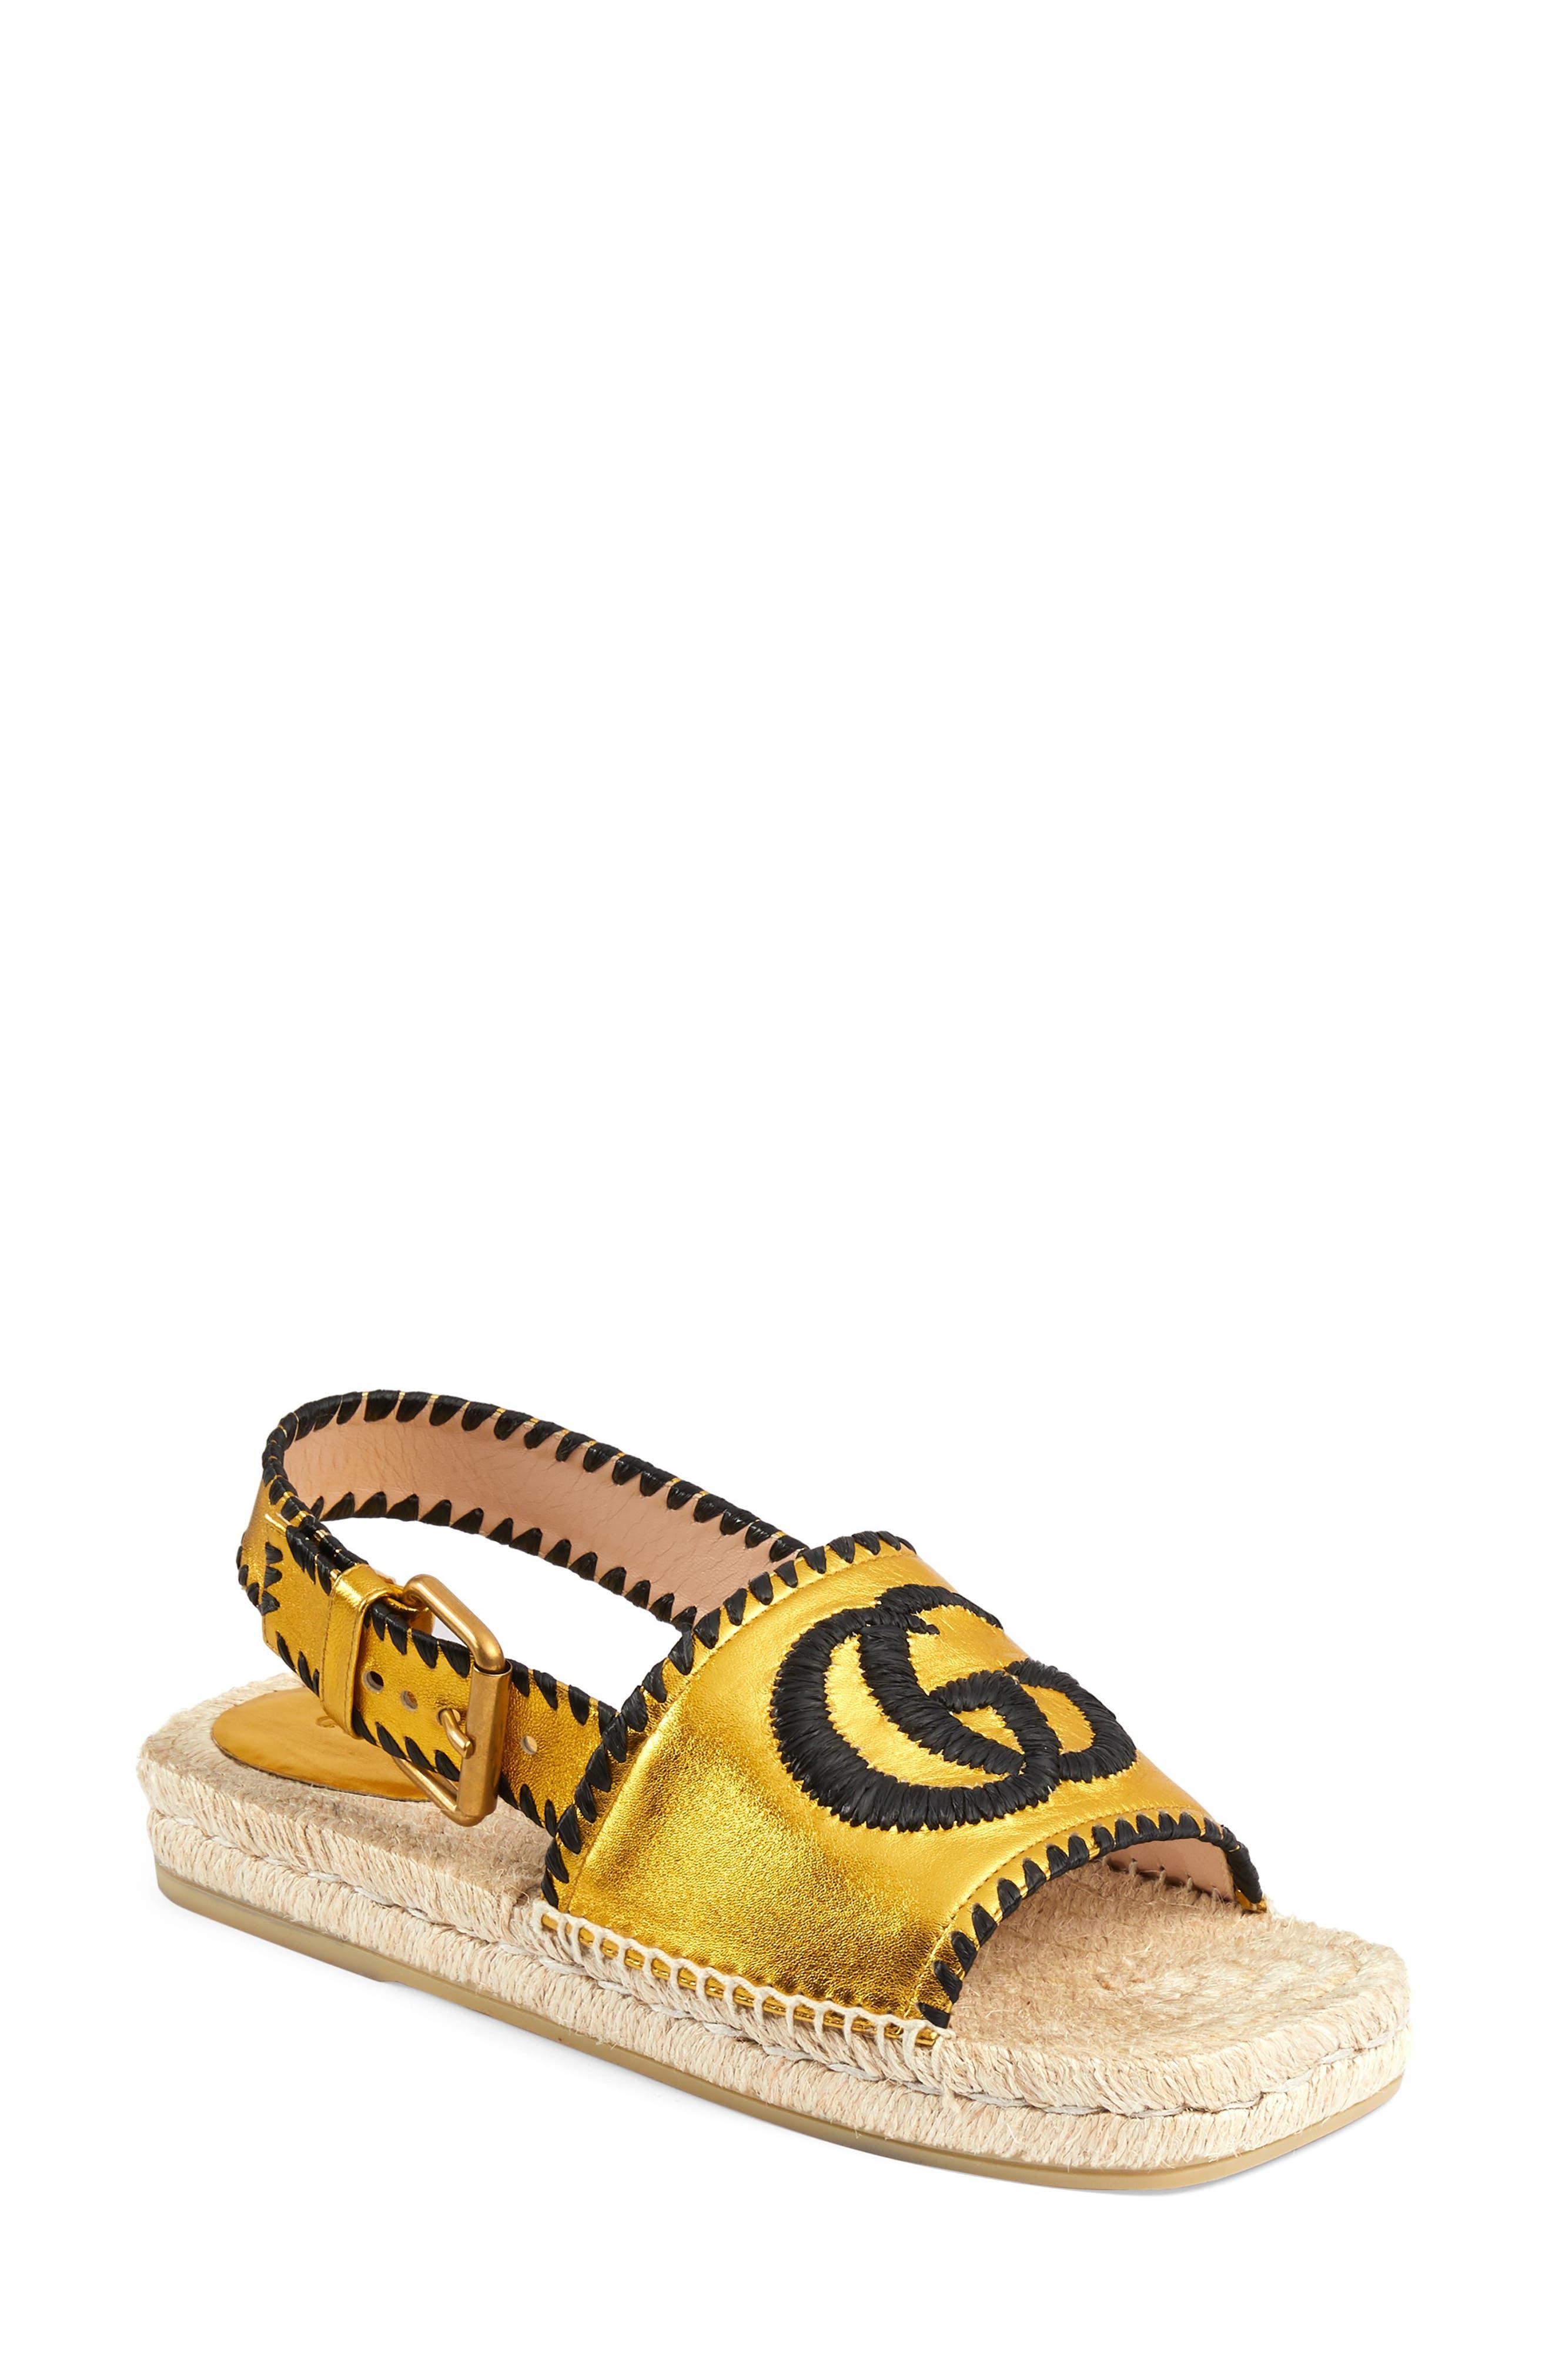 Gucci Pilar Embroidered Double G Logo Slingback Espadrille Sandal (Women)